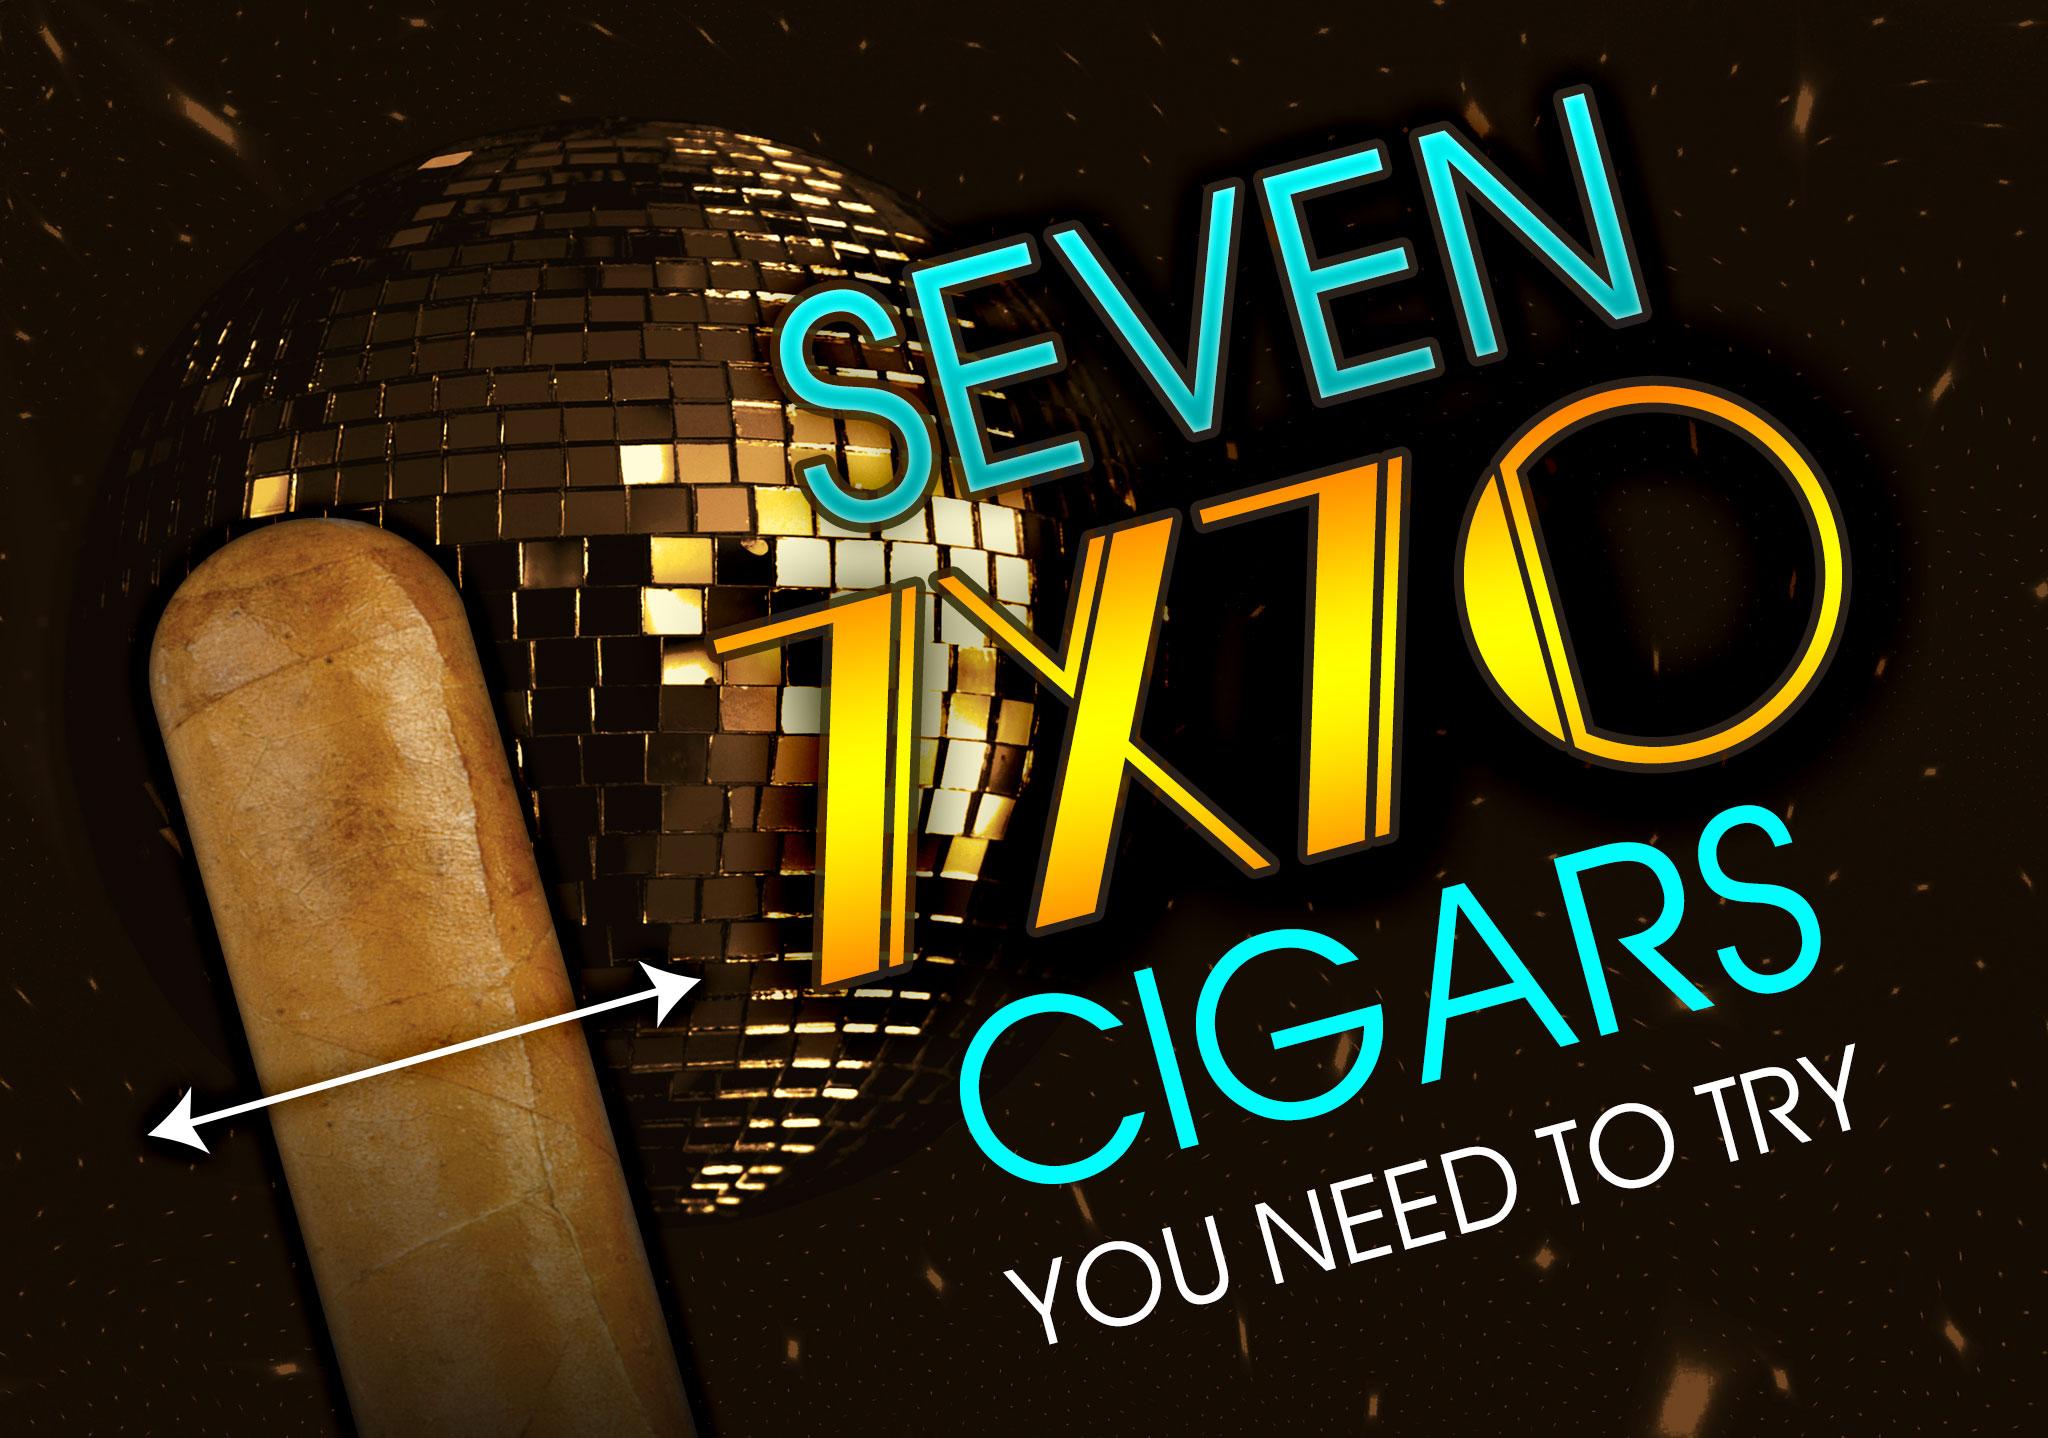 2015 CA Report: Top Seven 7 x 70 Ring Gauge Cigars